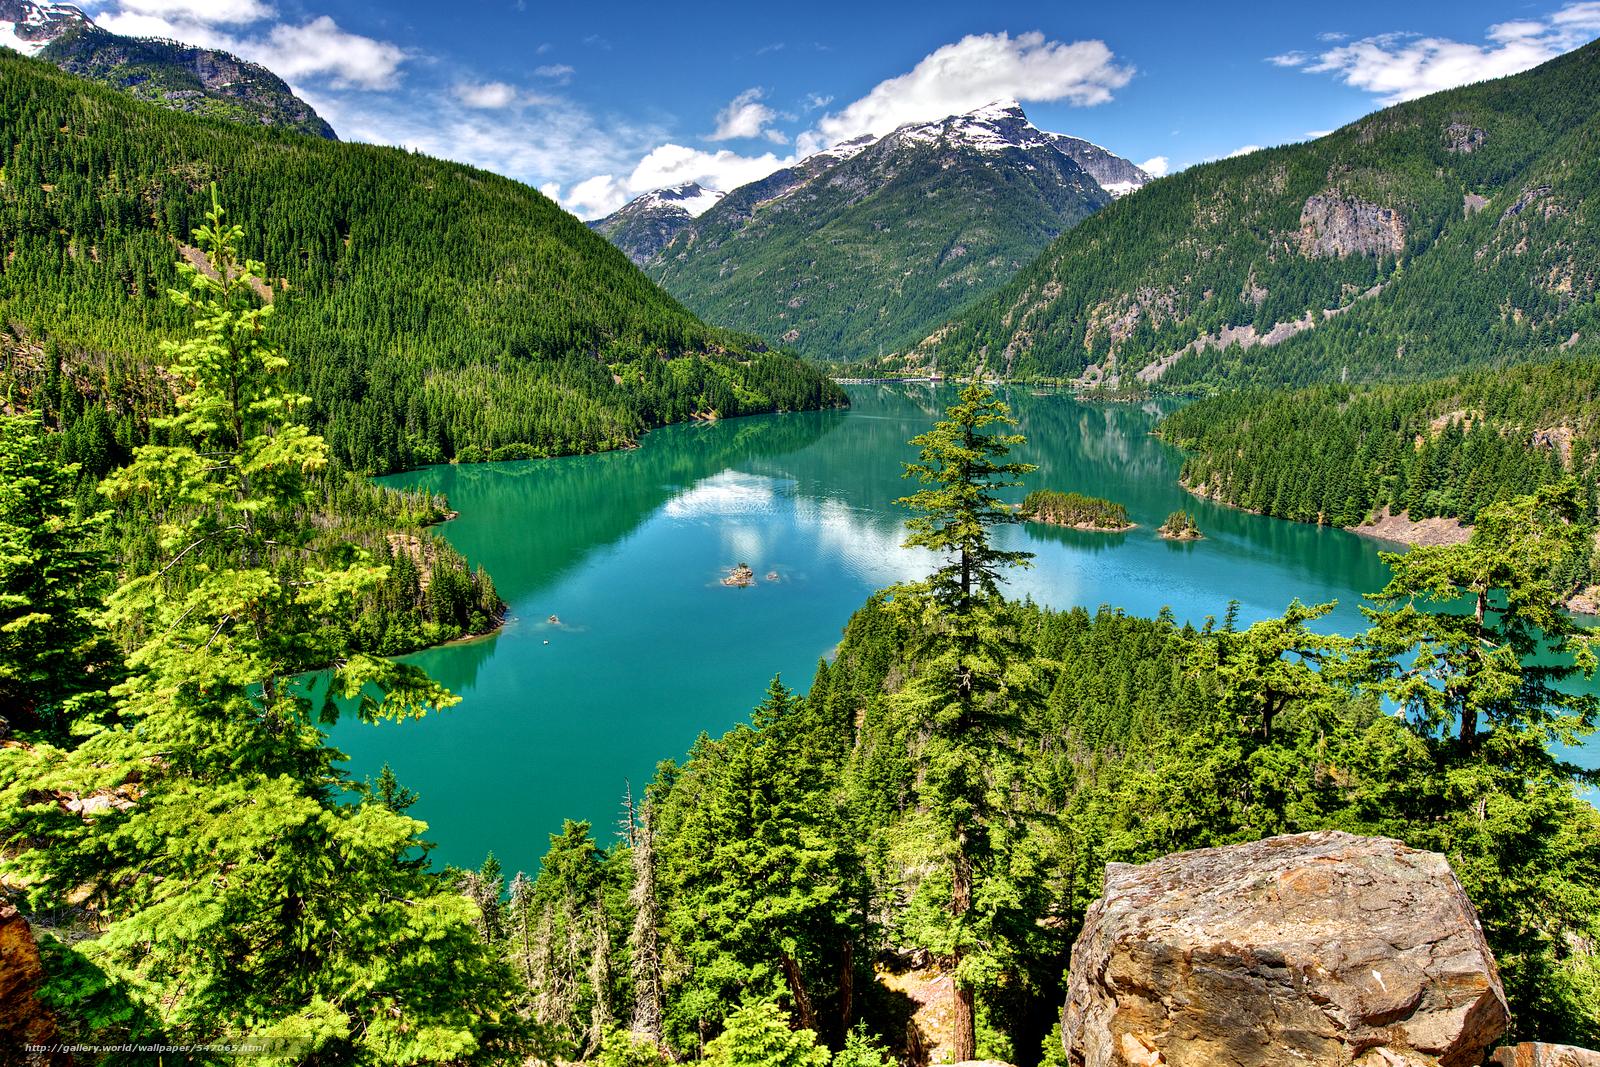 Download wallpaper North Cascades National Park Washington lake 1600x1067